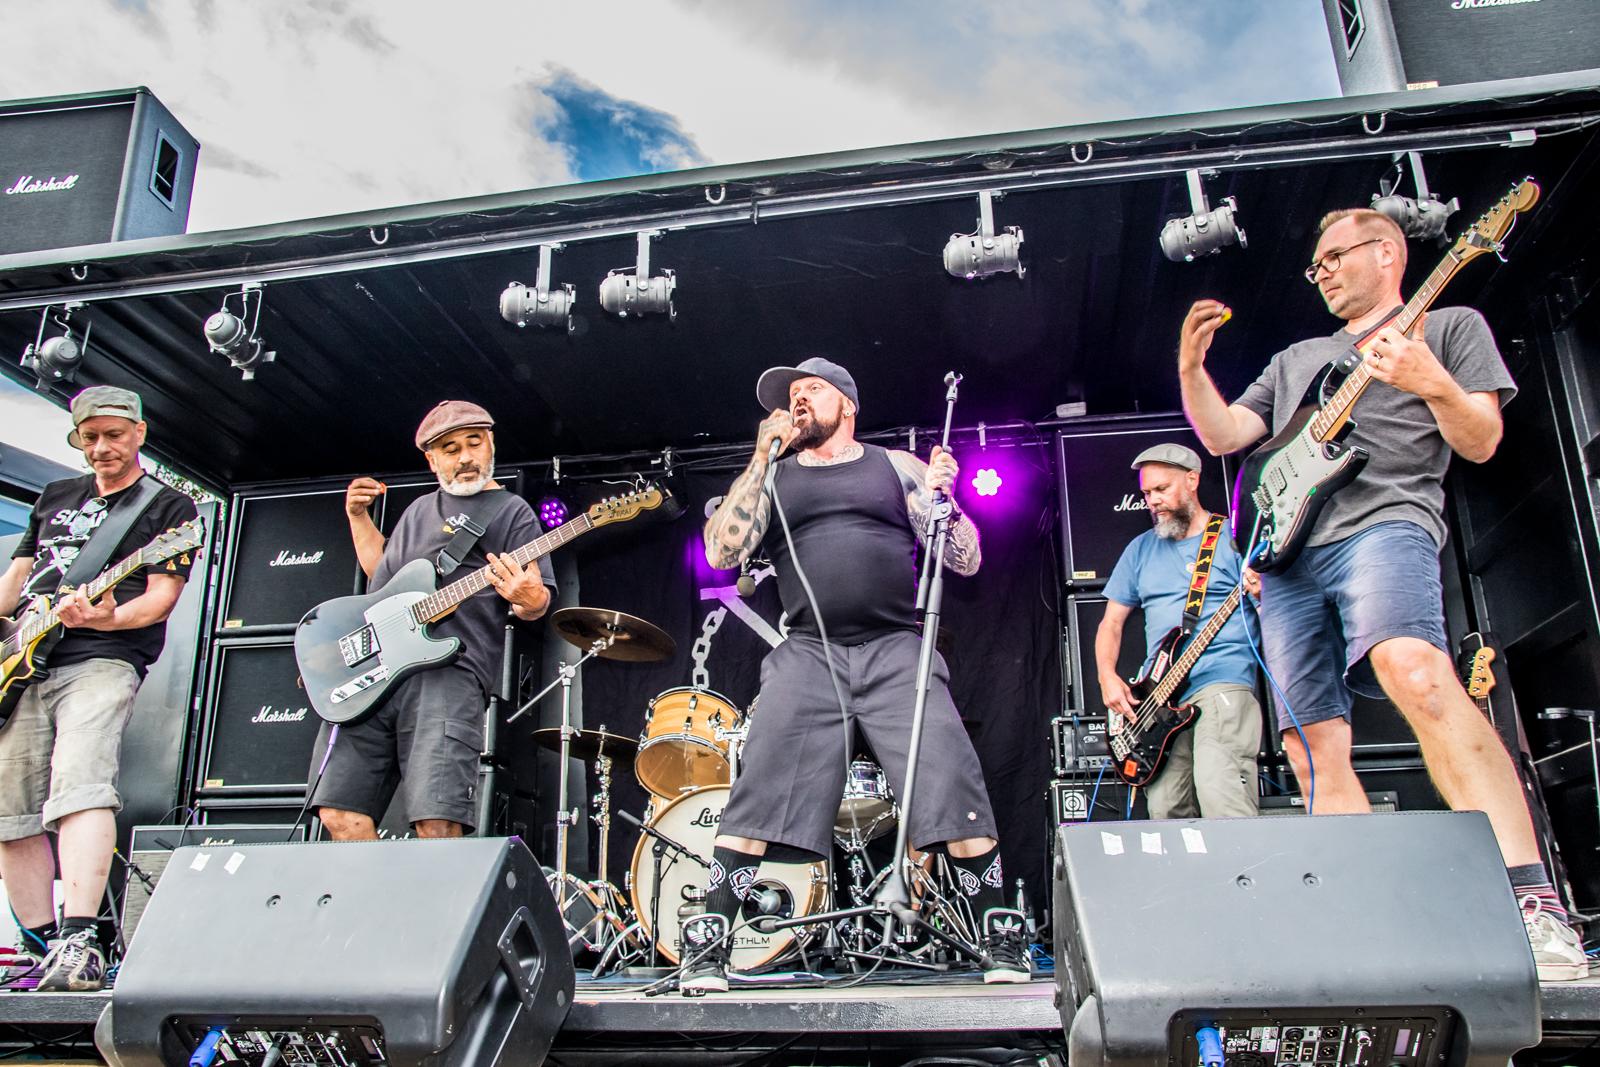 Reunion 2016: Bowlstock